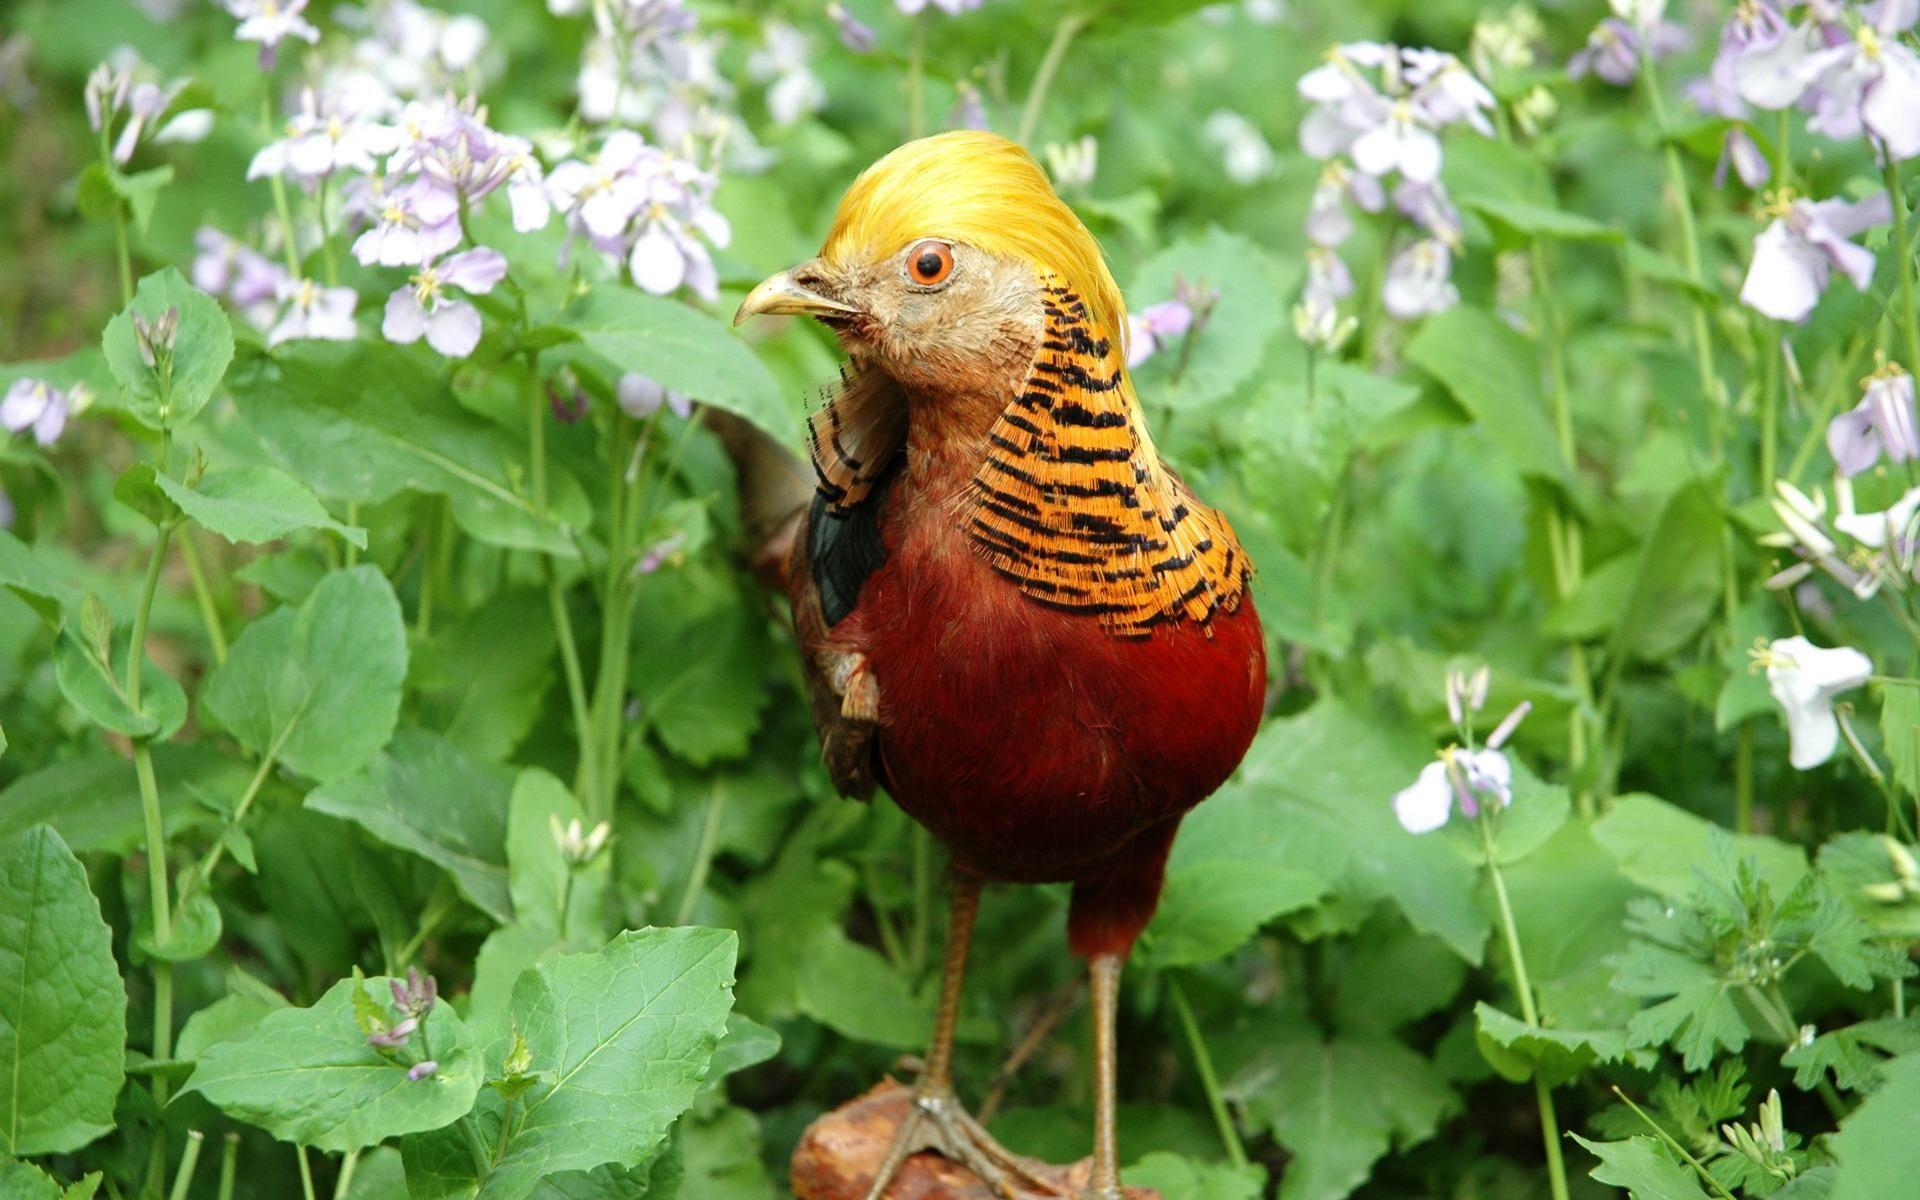 Lovely Golden Pheasant Wallpapers Hd Wallpaper Golden